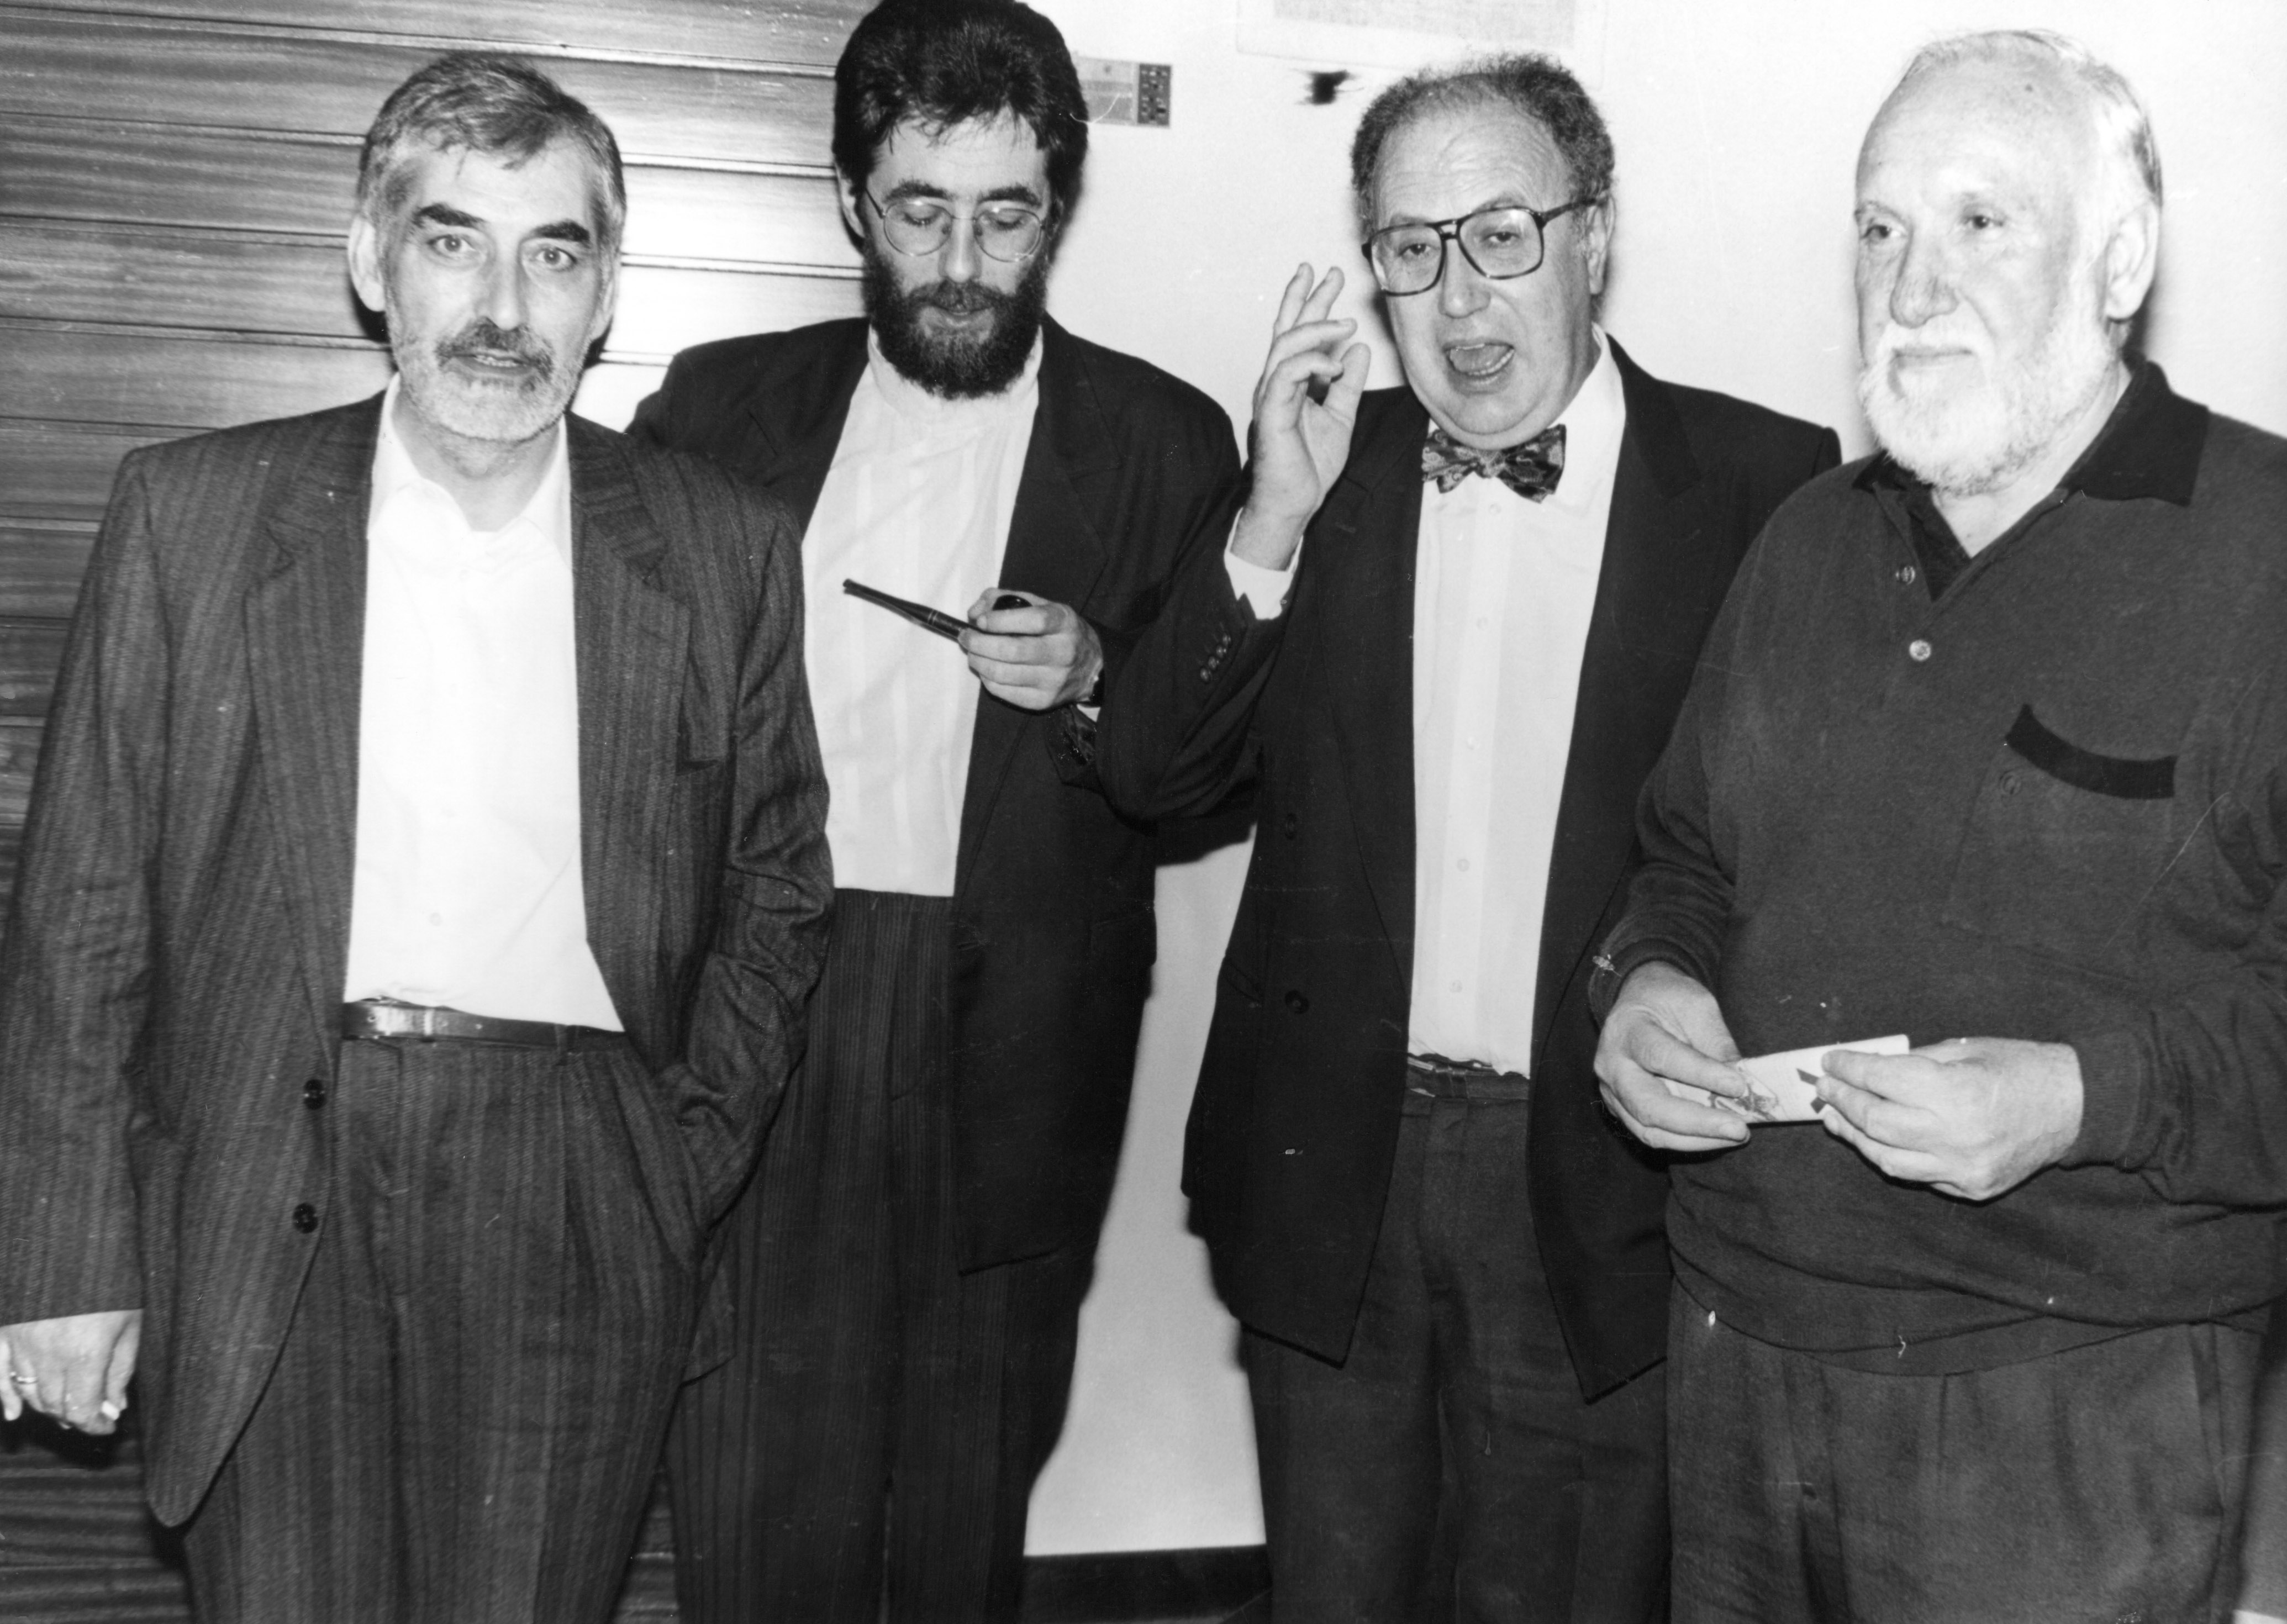 Manuel María, Darío Xohán Cabana, Xosé Luis Mendez Ferrín, Uxío Novoneyra